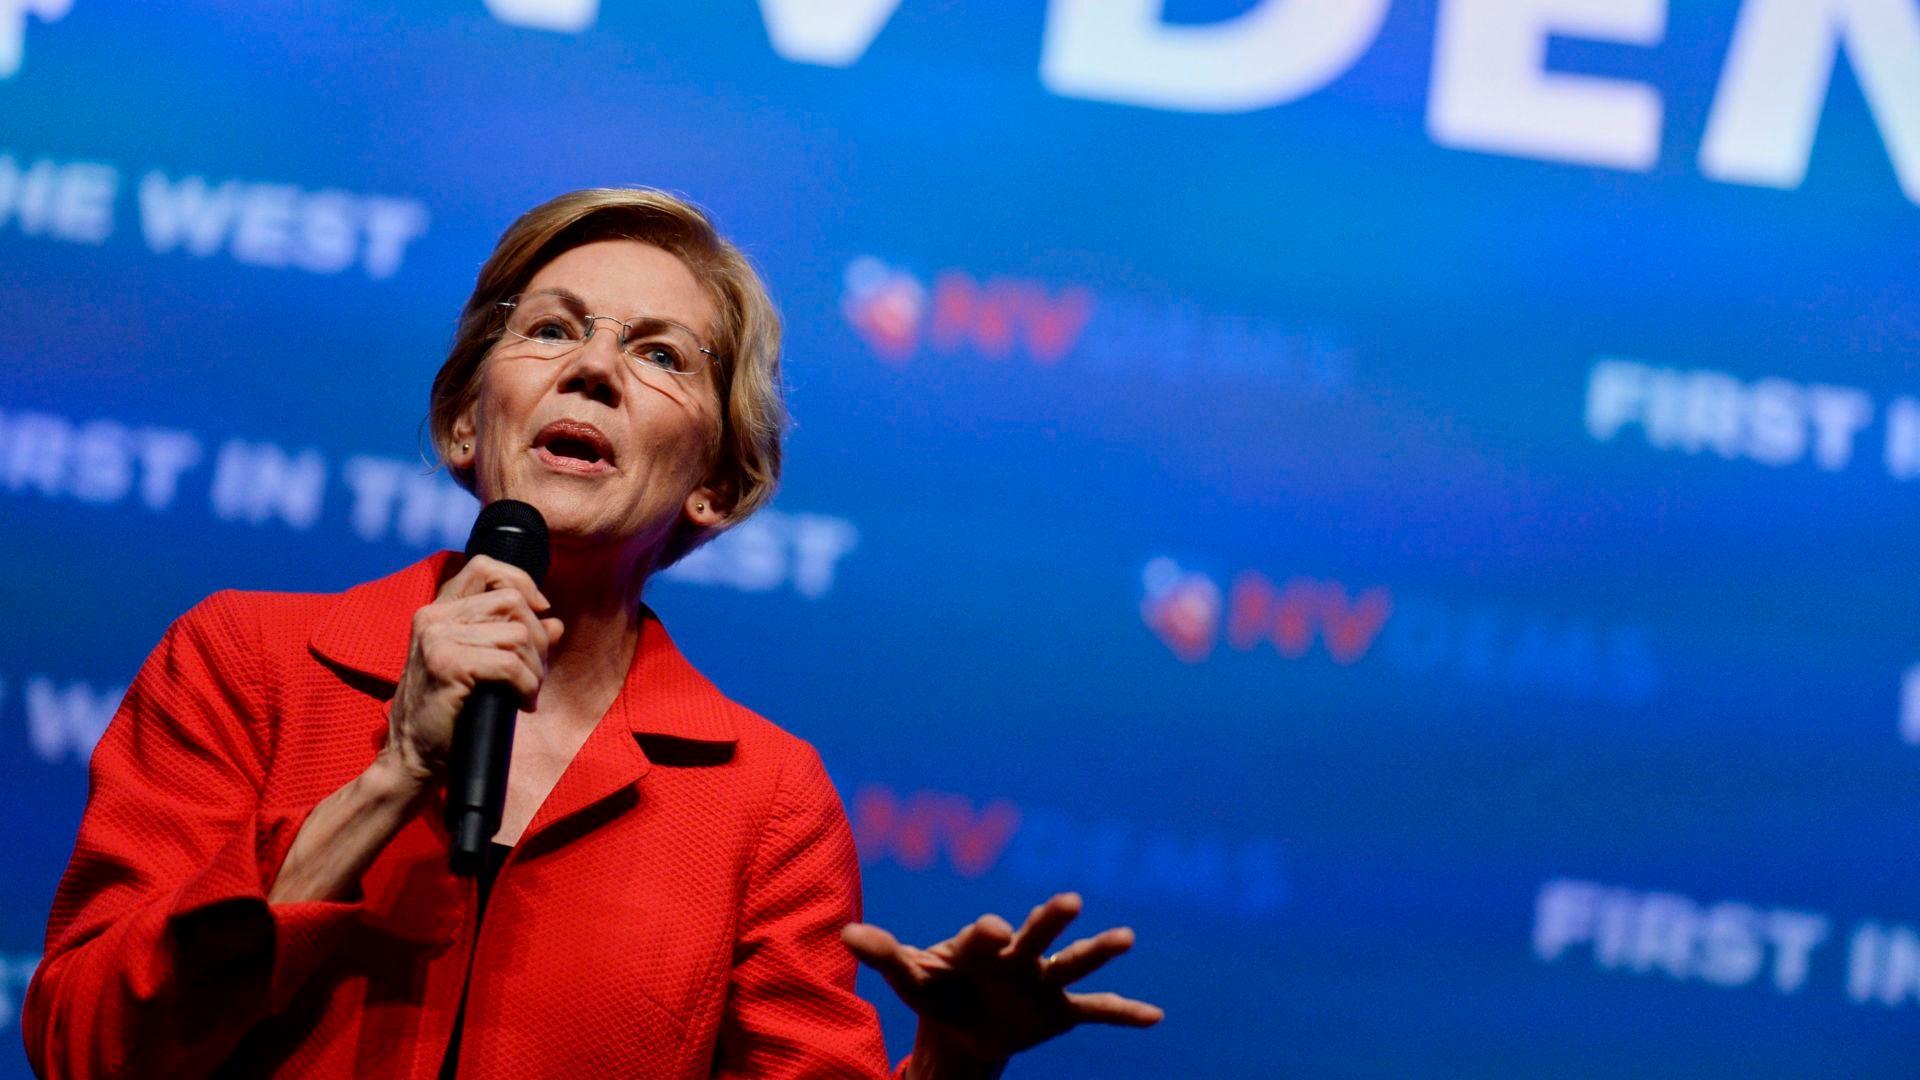 Elizabeth Warren On Marijuana: 'Legalize It'